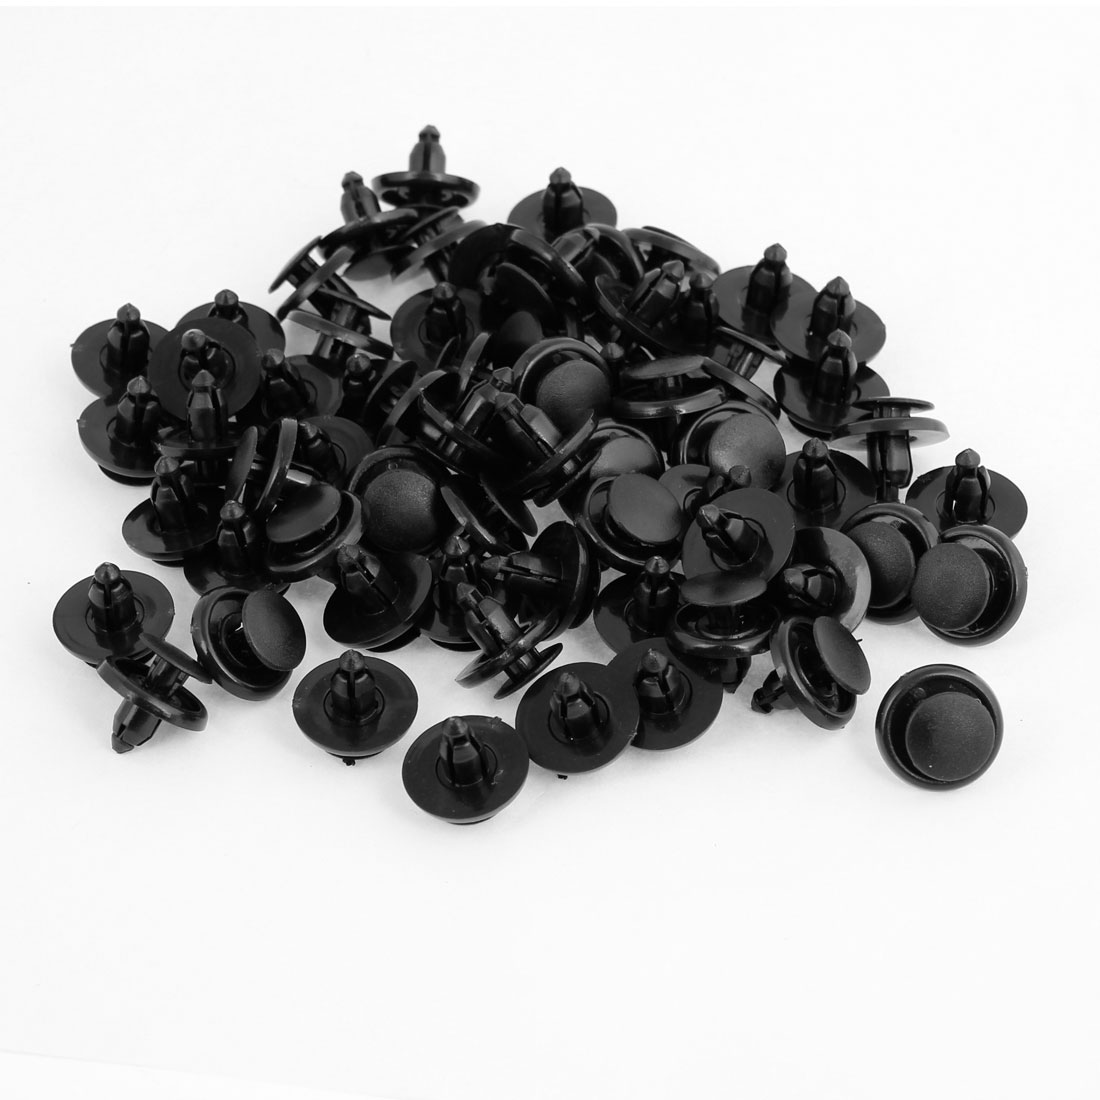 100 Pcs Replacing Parts Plastic Push in Type Fastener Rivets Black